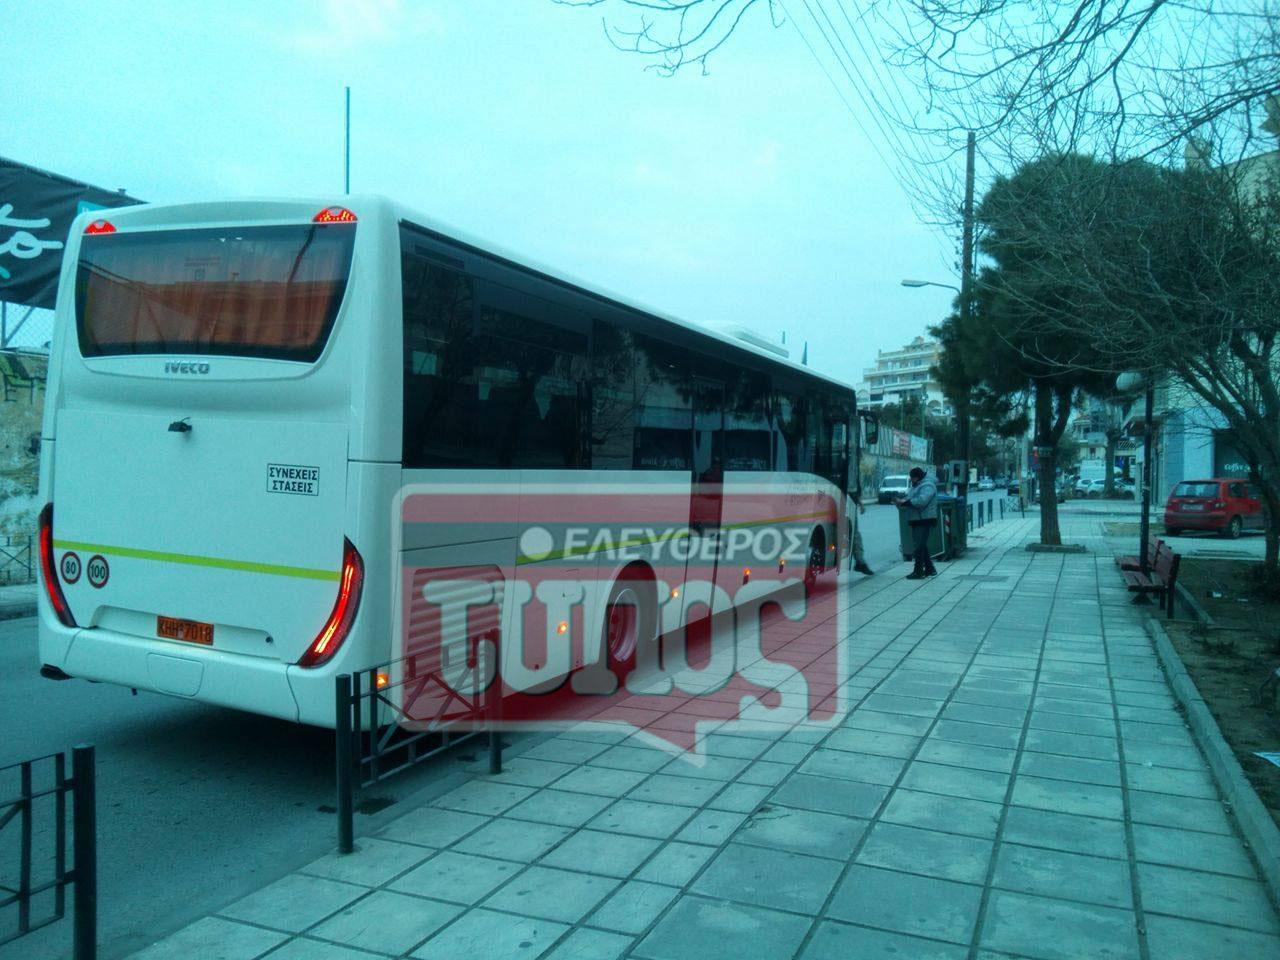 kordelio-ekkeosi-vomva-13 Λήξη συναγερμού στο Κορδελιό - Επιστρέφουν οι κάτοικοι